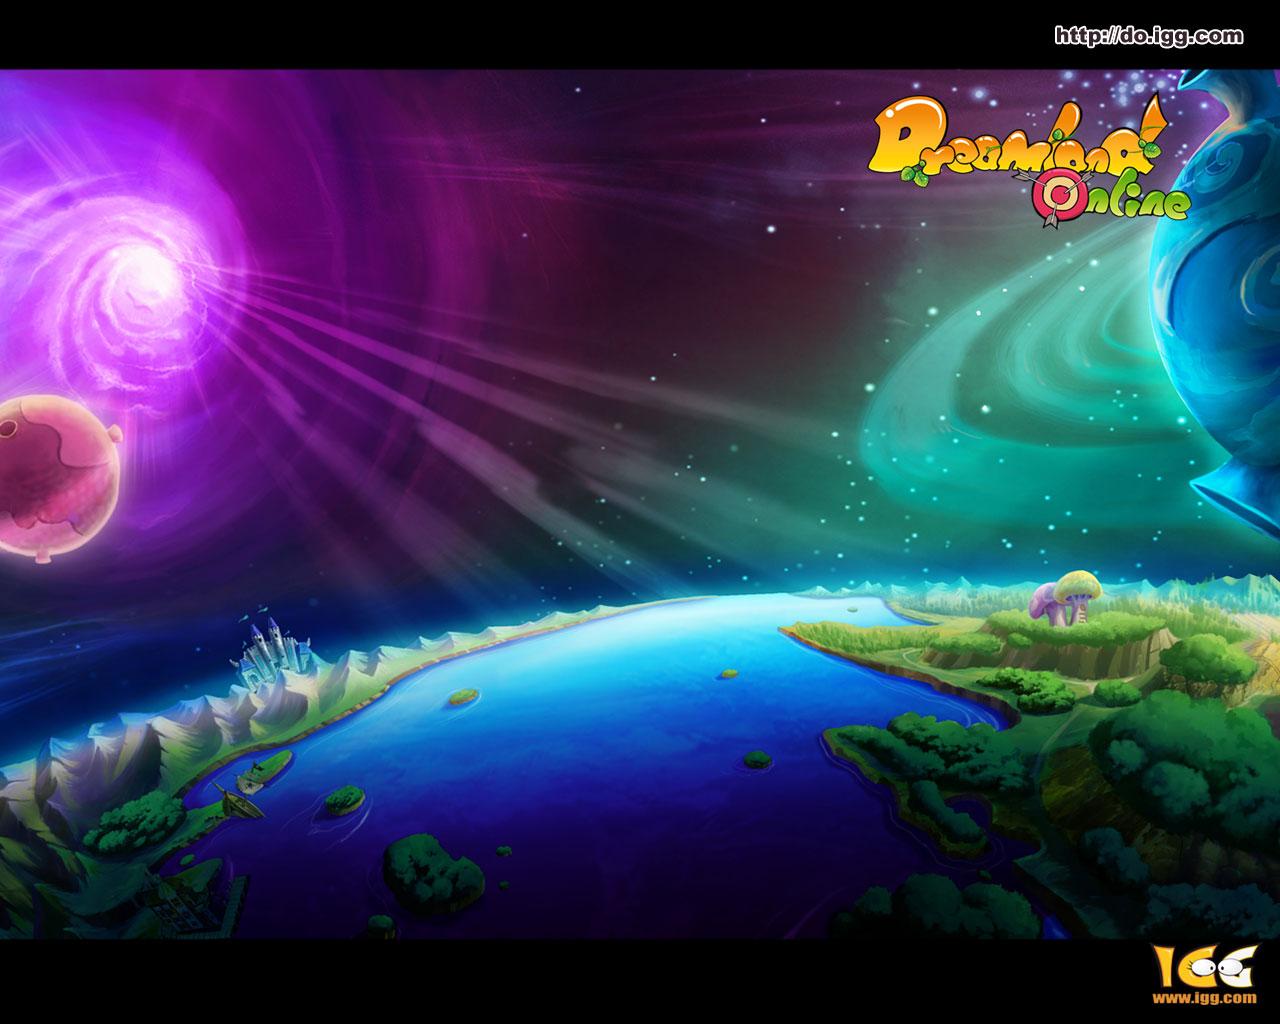 dreamscape land 1280 x 1024pix wallpaper nature 2d